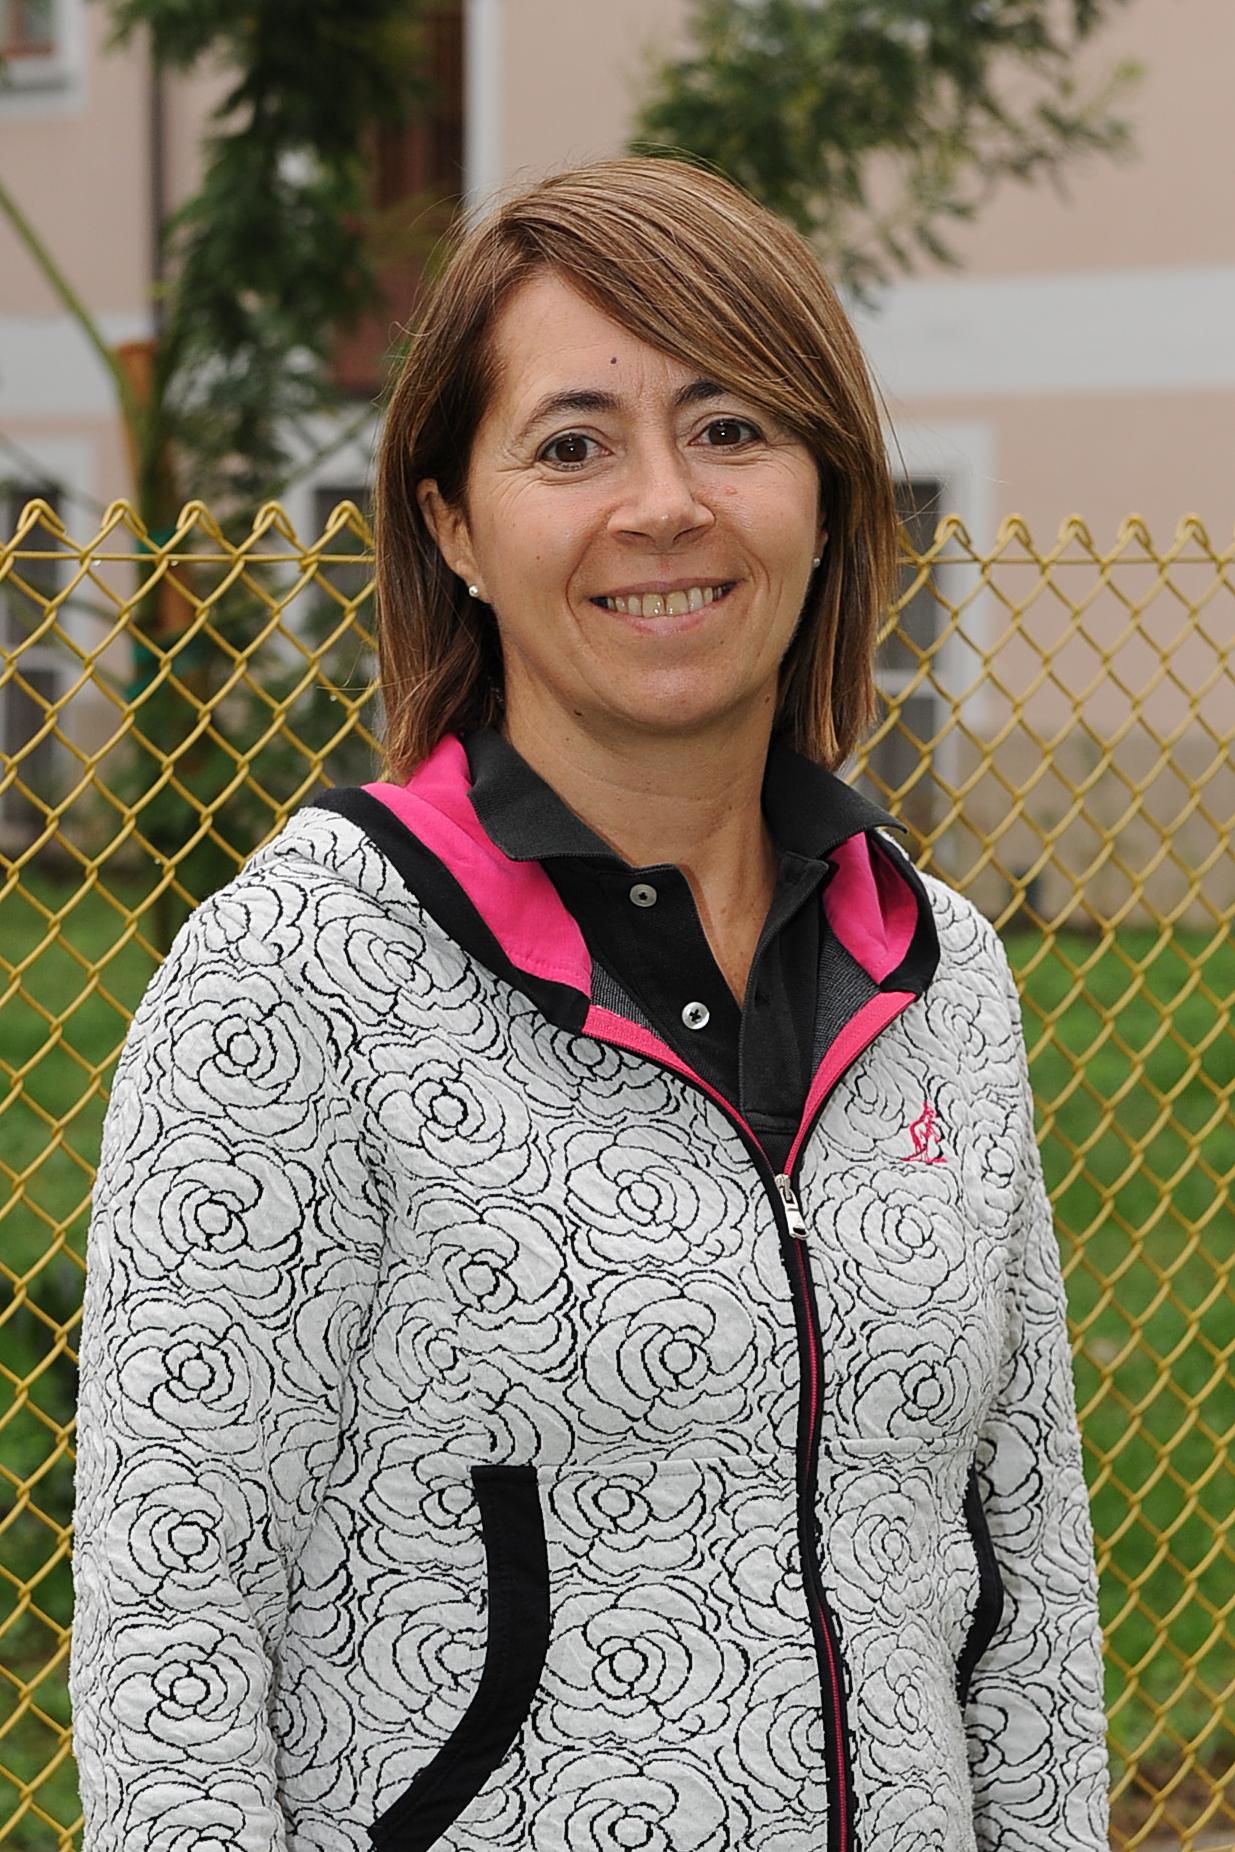 Scuola Primaria - Educazione Motoria - Simona Fabbrini